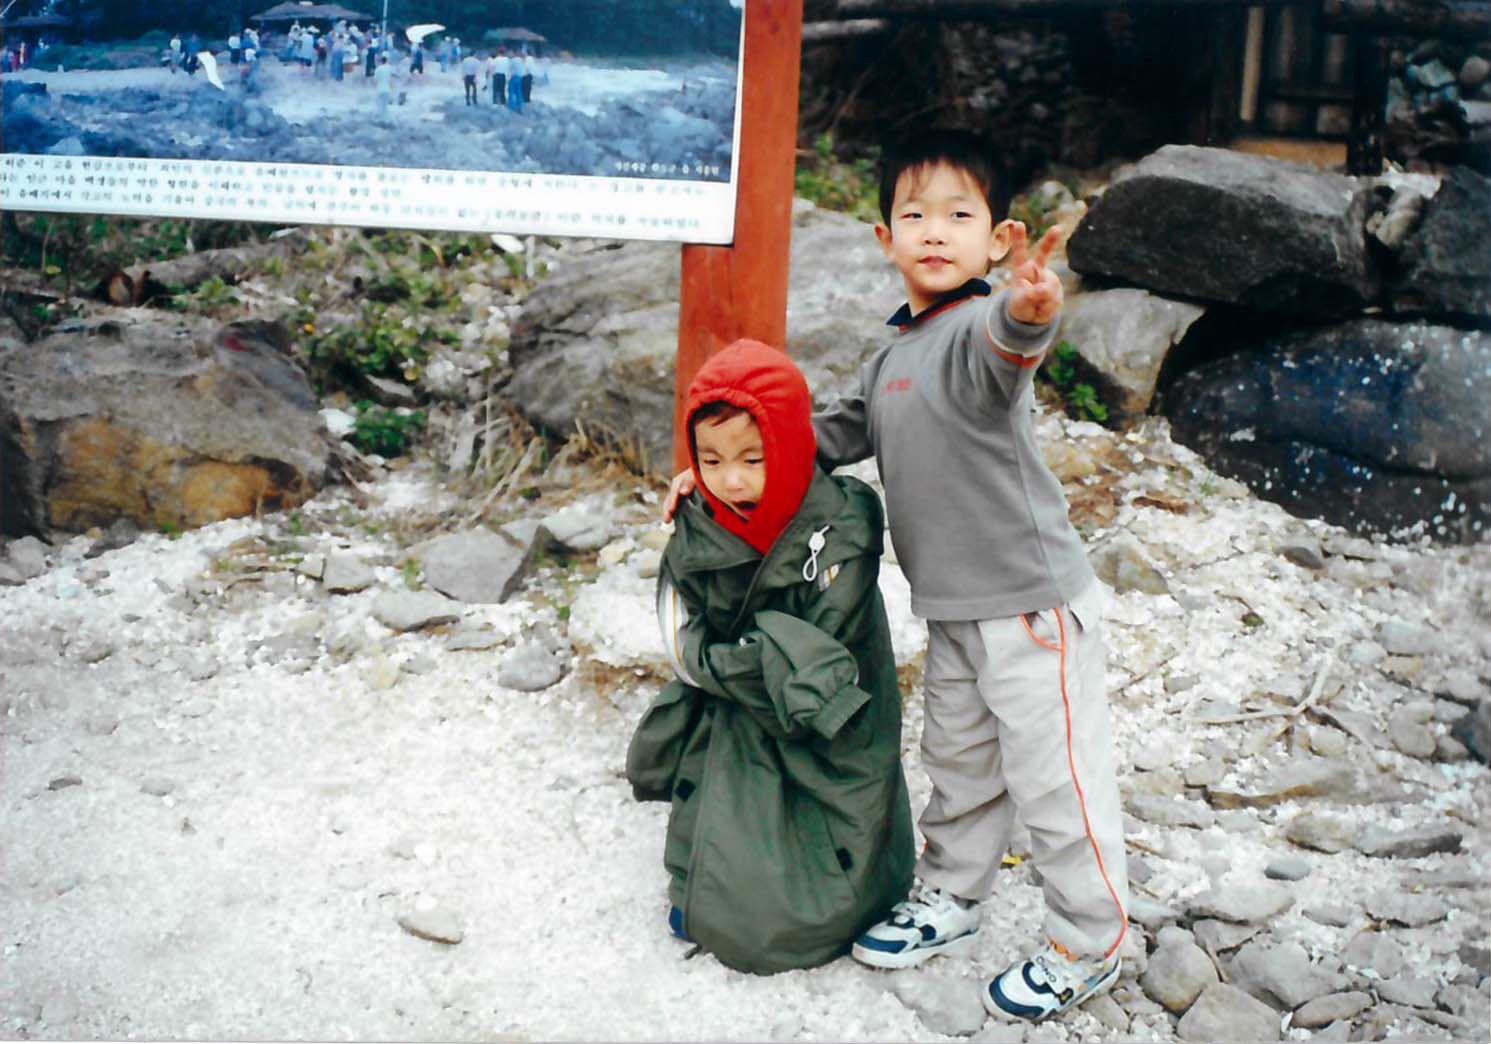 Baby Seonghwa With His Older Brother Cambridge Satchel Company Koba Park